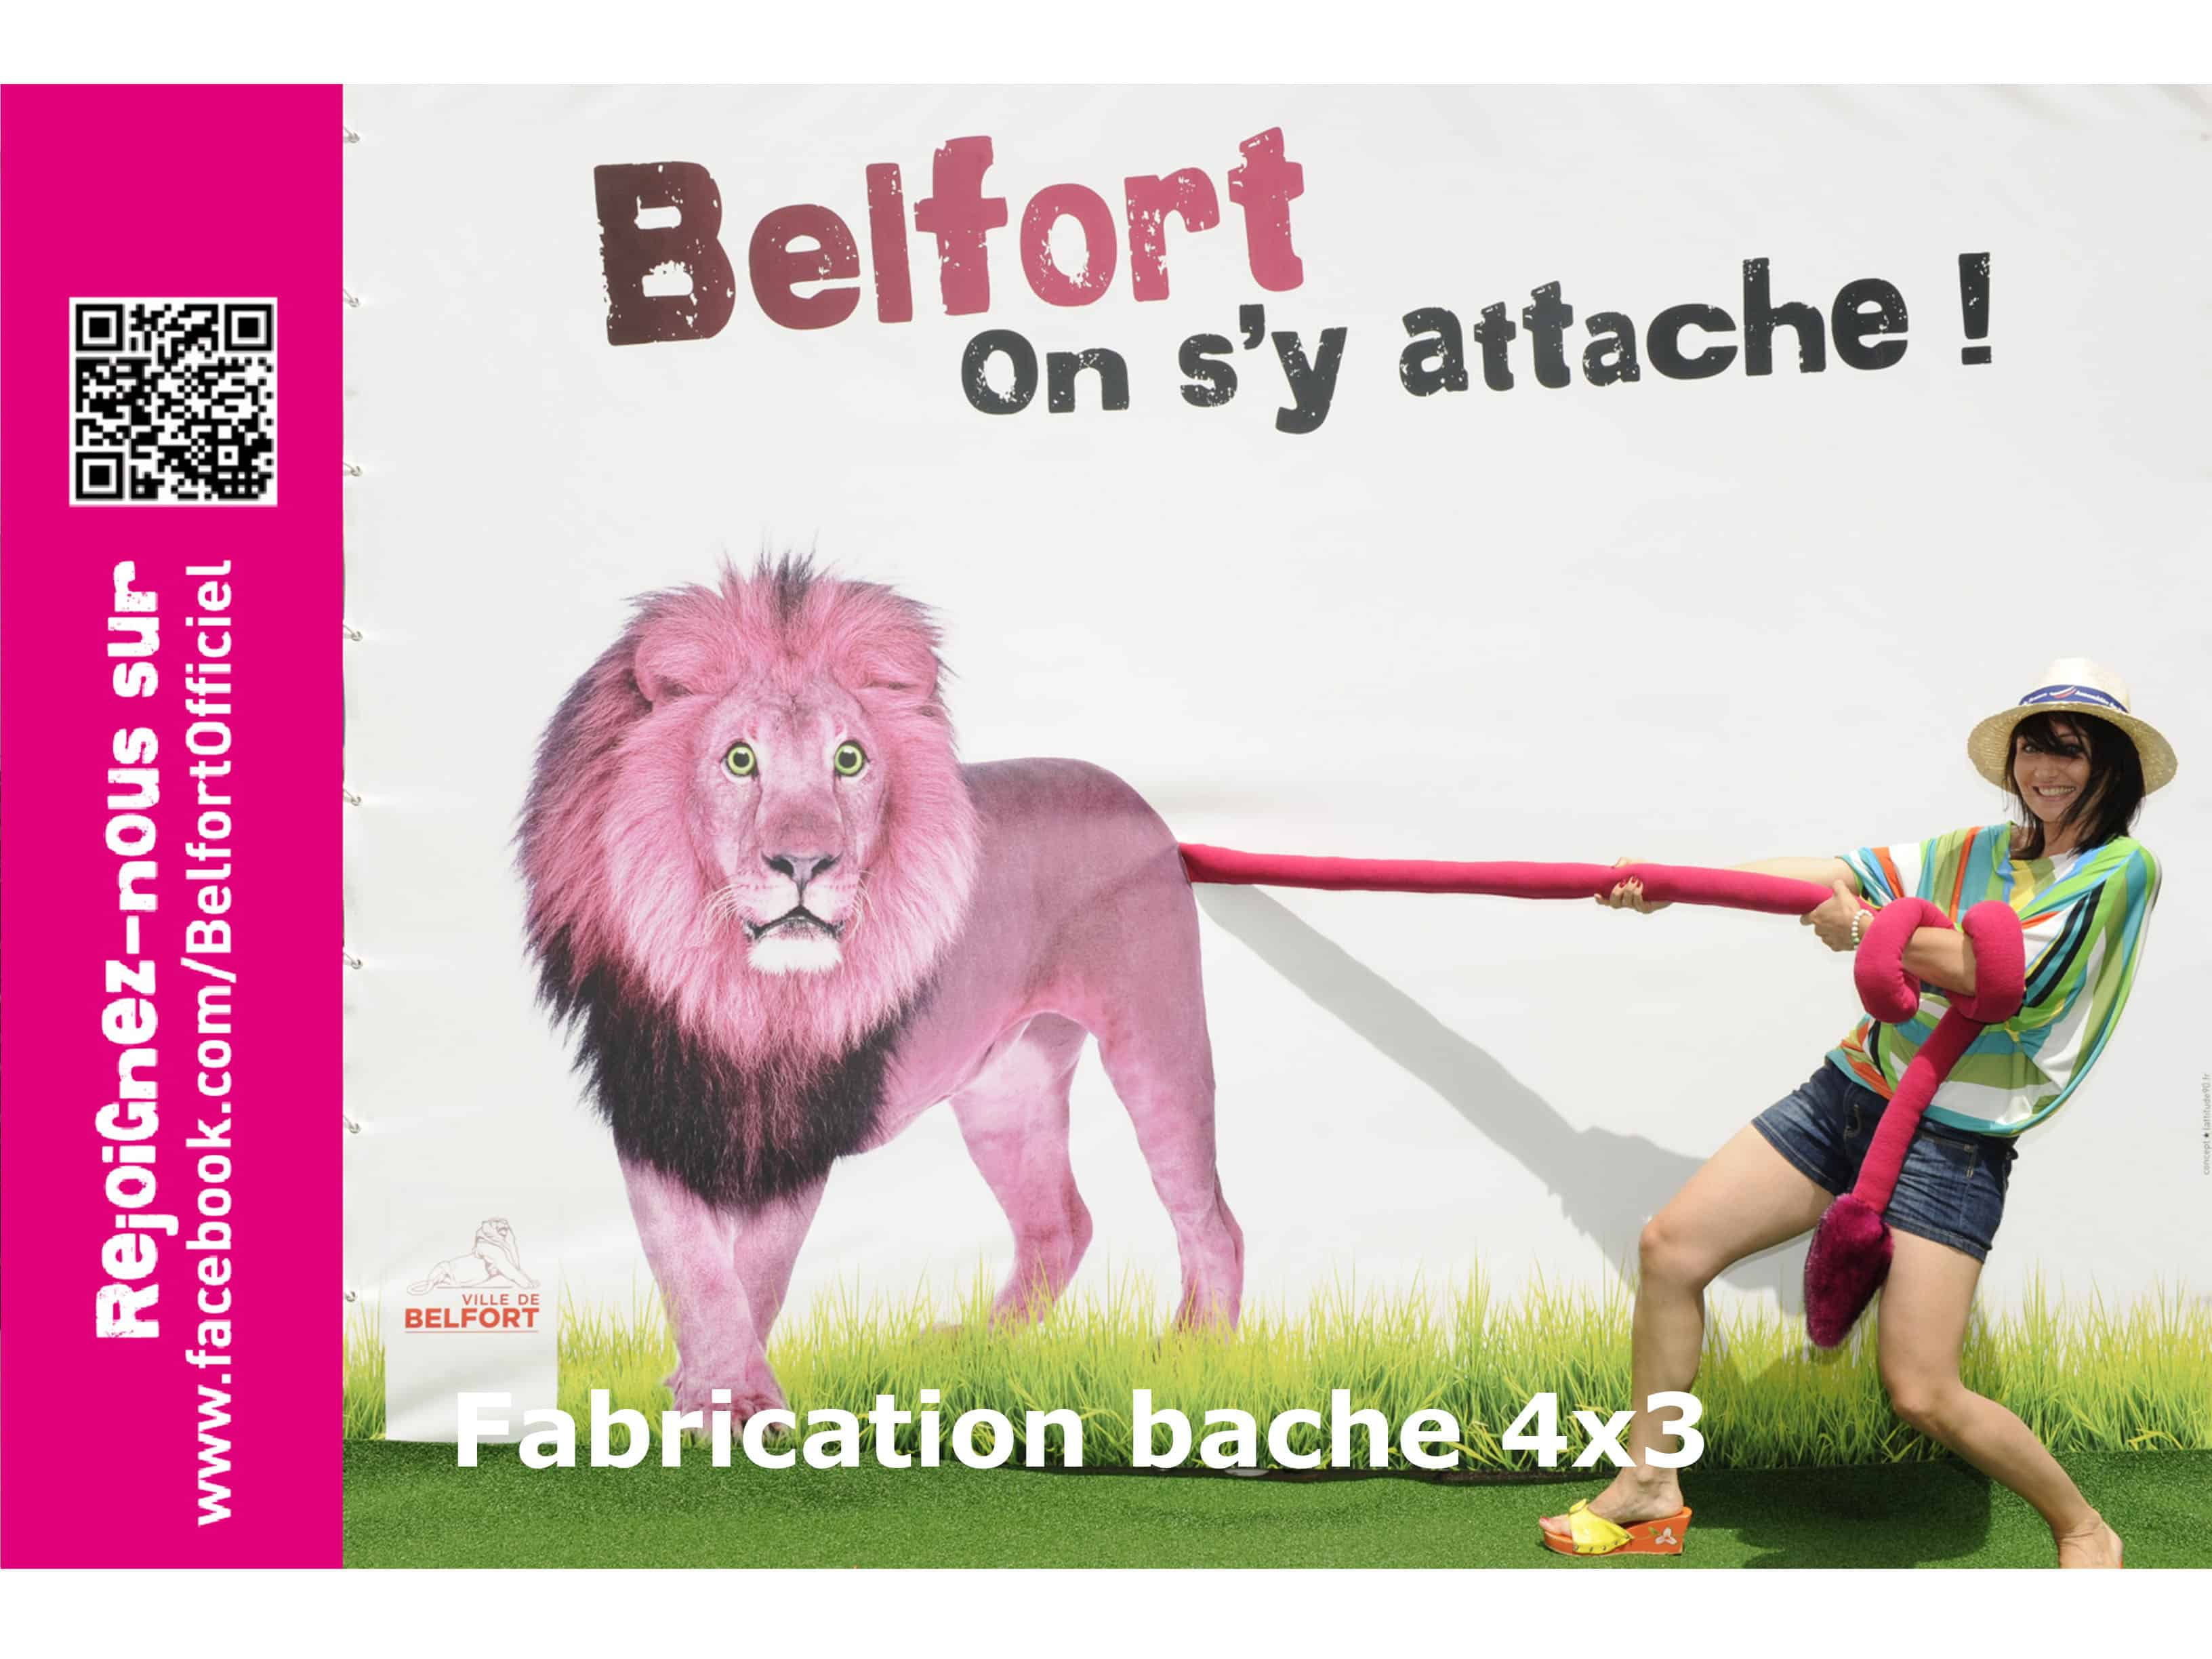 fabrication de bache photobooth 2 - Photobooth et vidéobooth Paris, Location photomaton